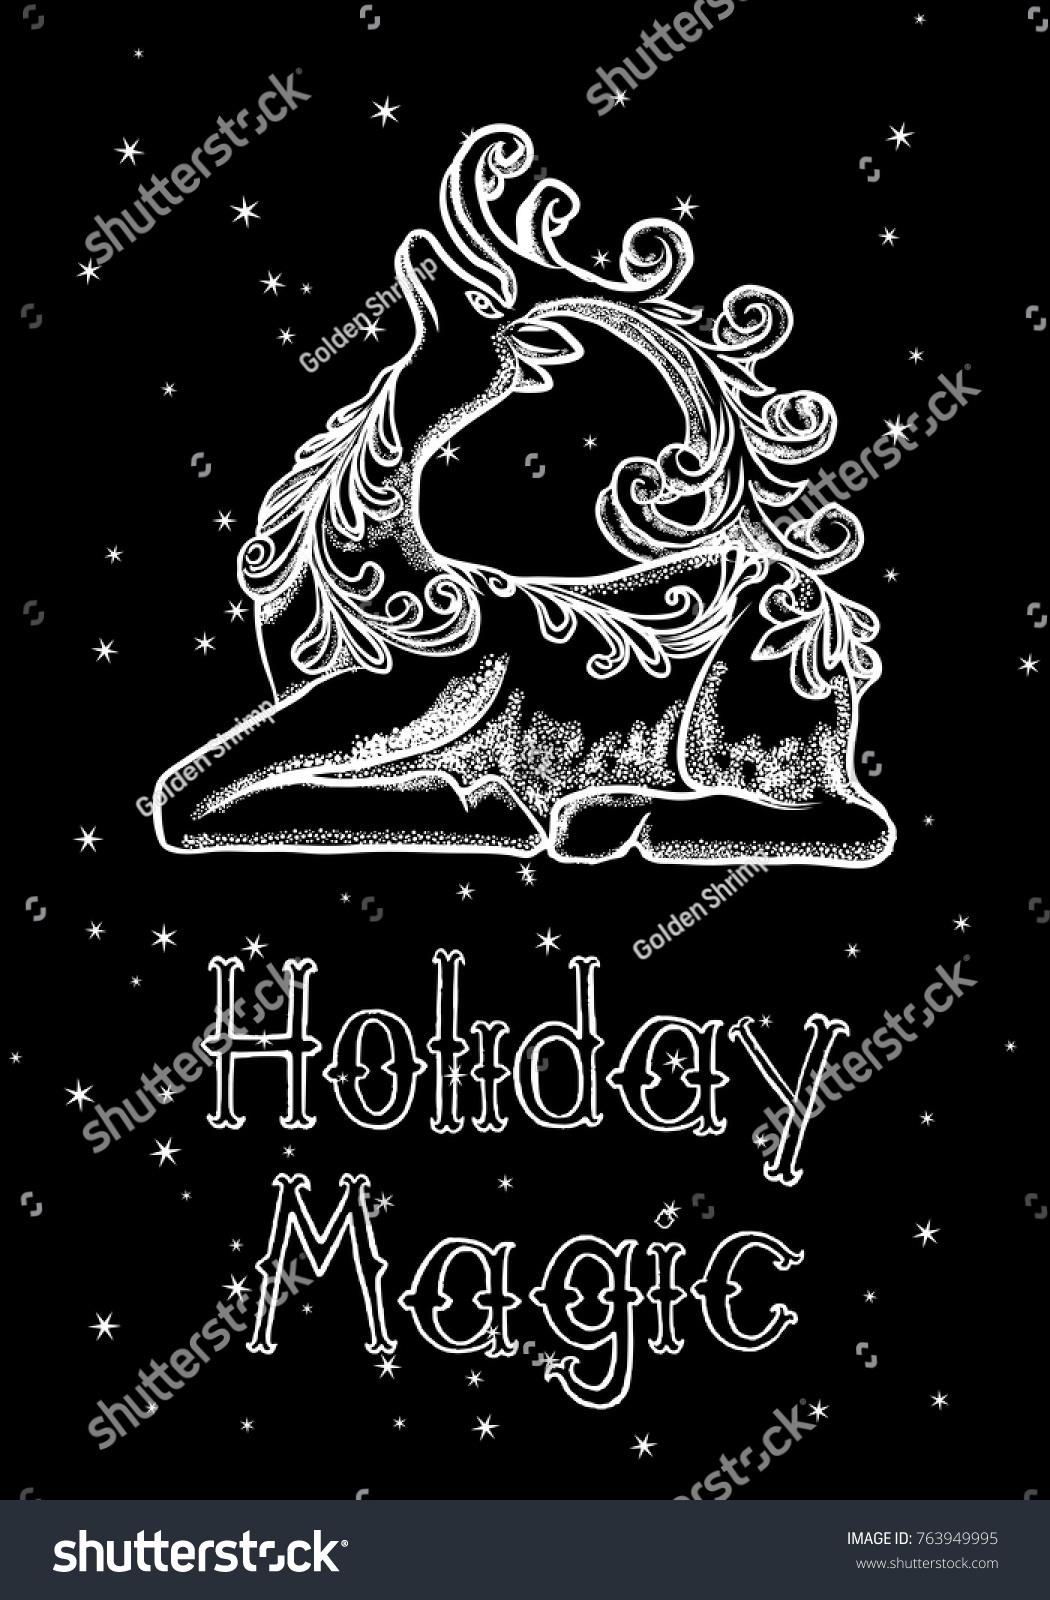 Merry christmas happy new year hand stock vector 763949995 merry christmas and happy new year hand drawn greeting card 2018 merry xmas seasons greeting kristyandbryce Choice Image